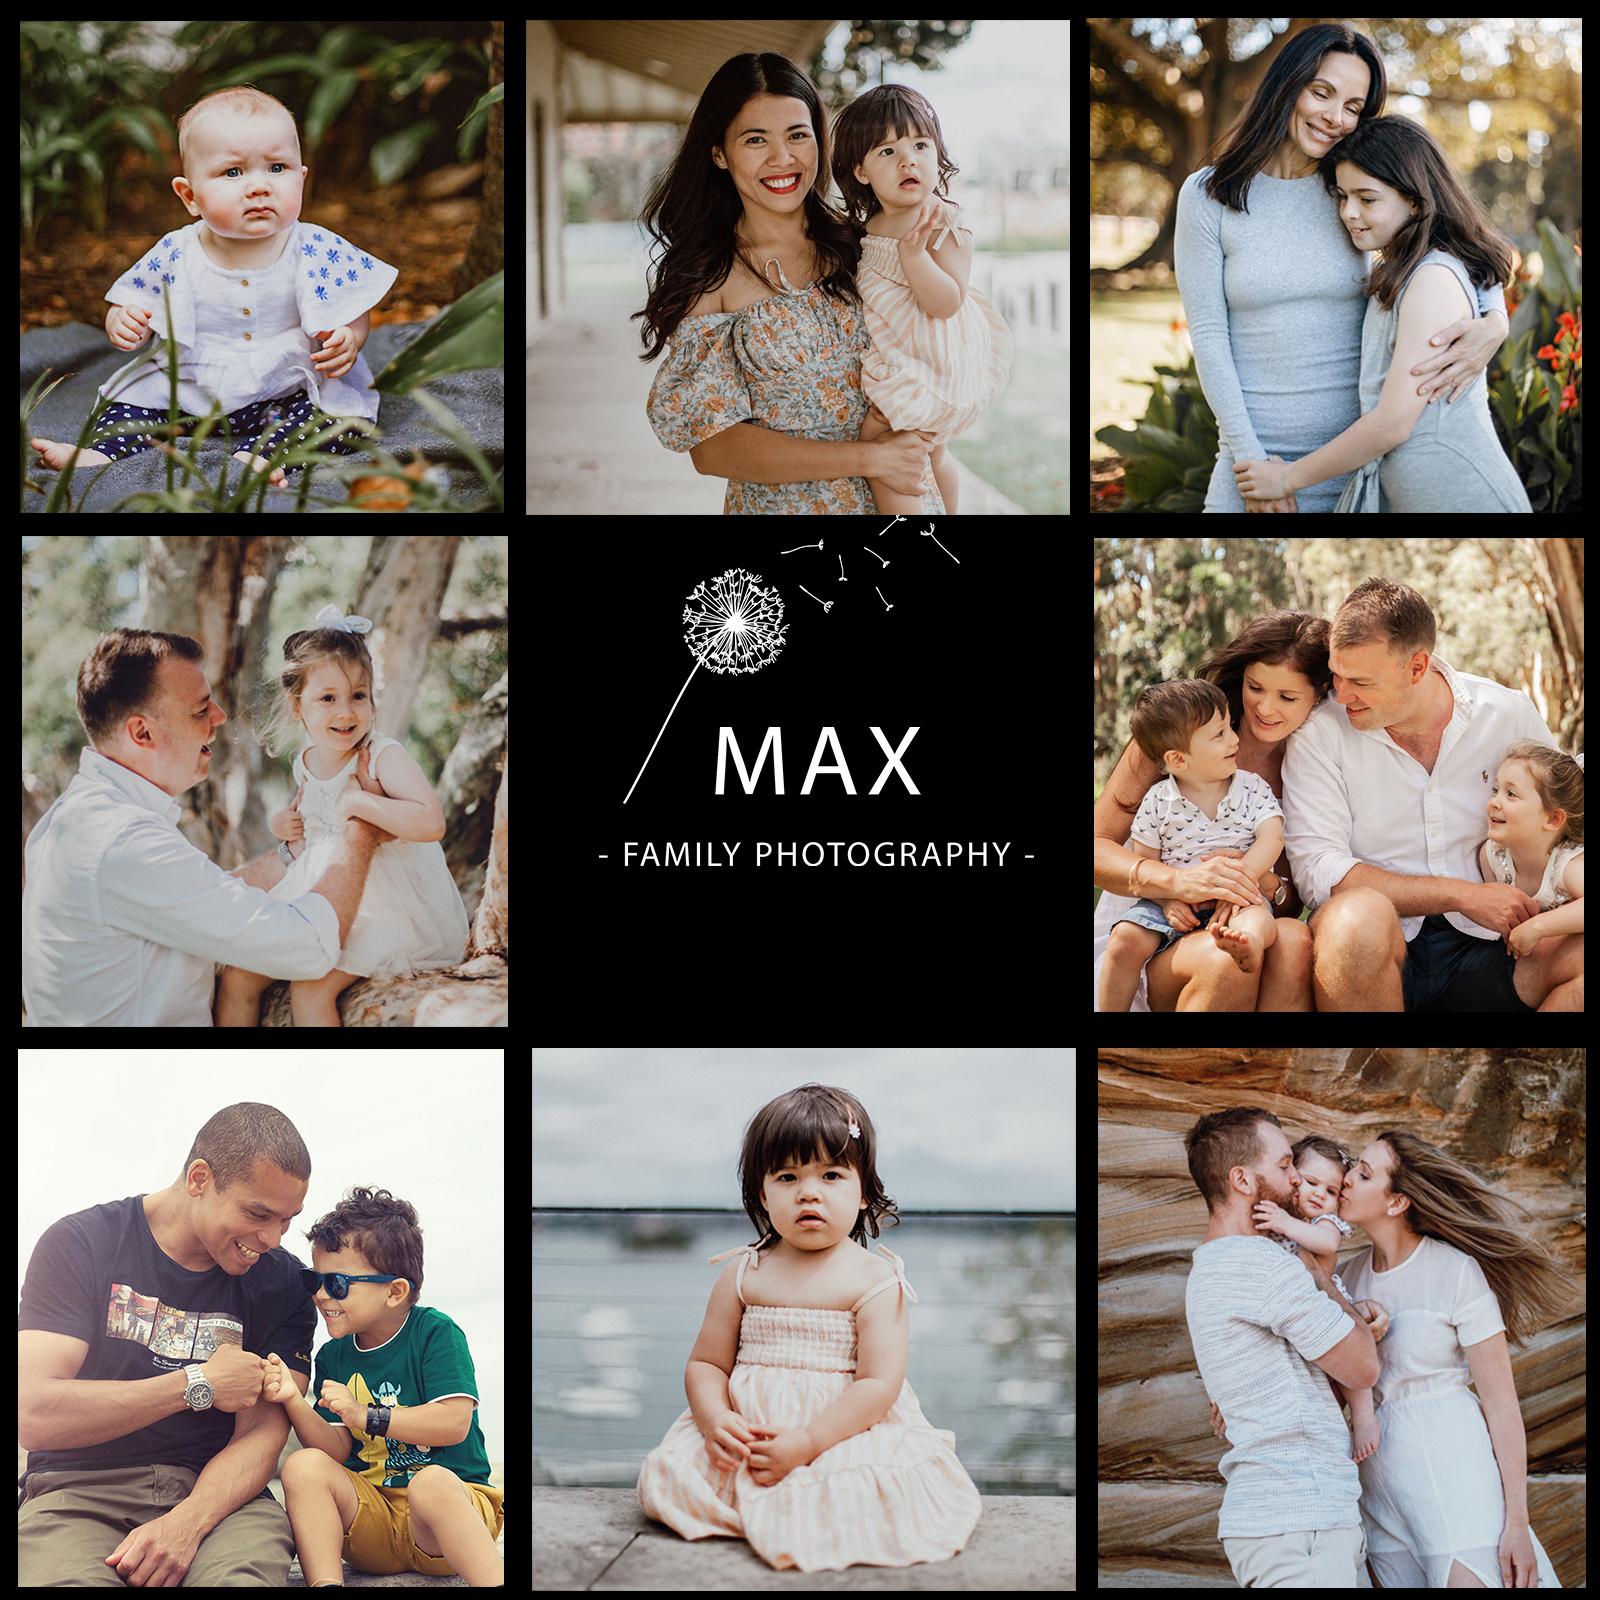 MAX Family Photography